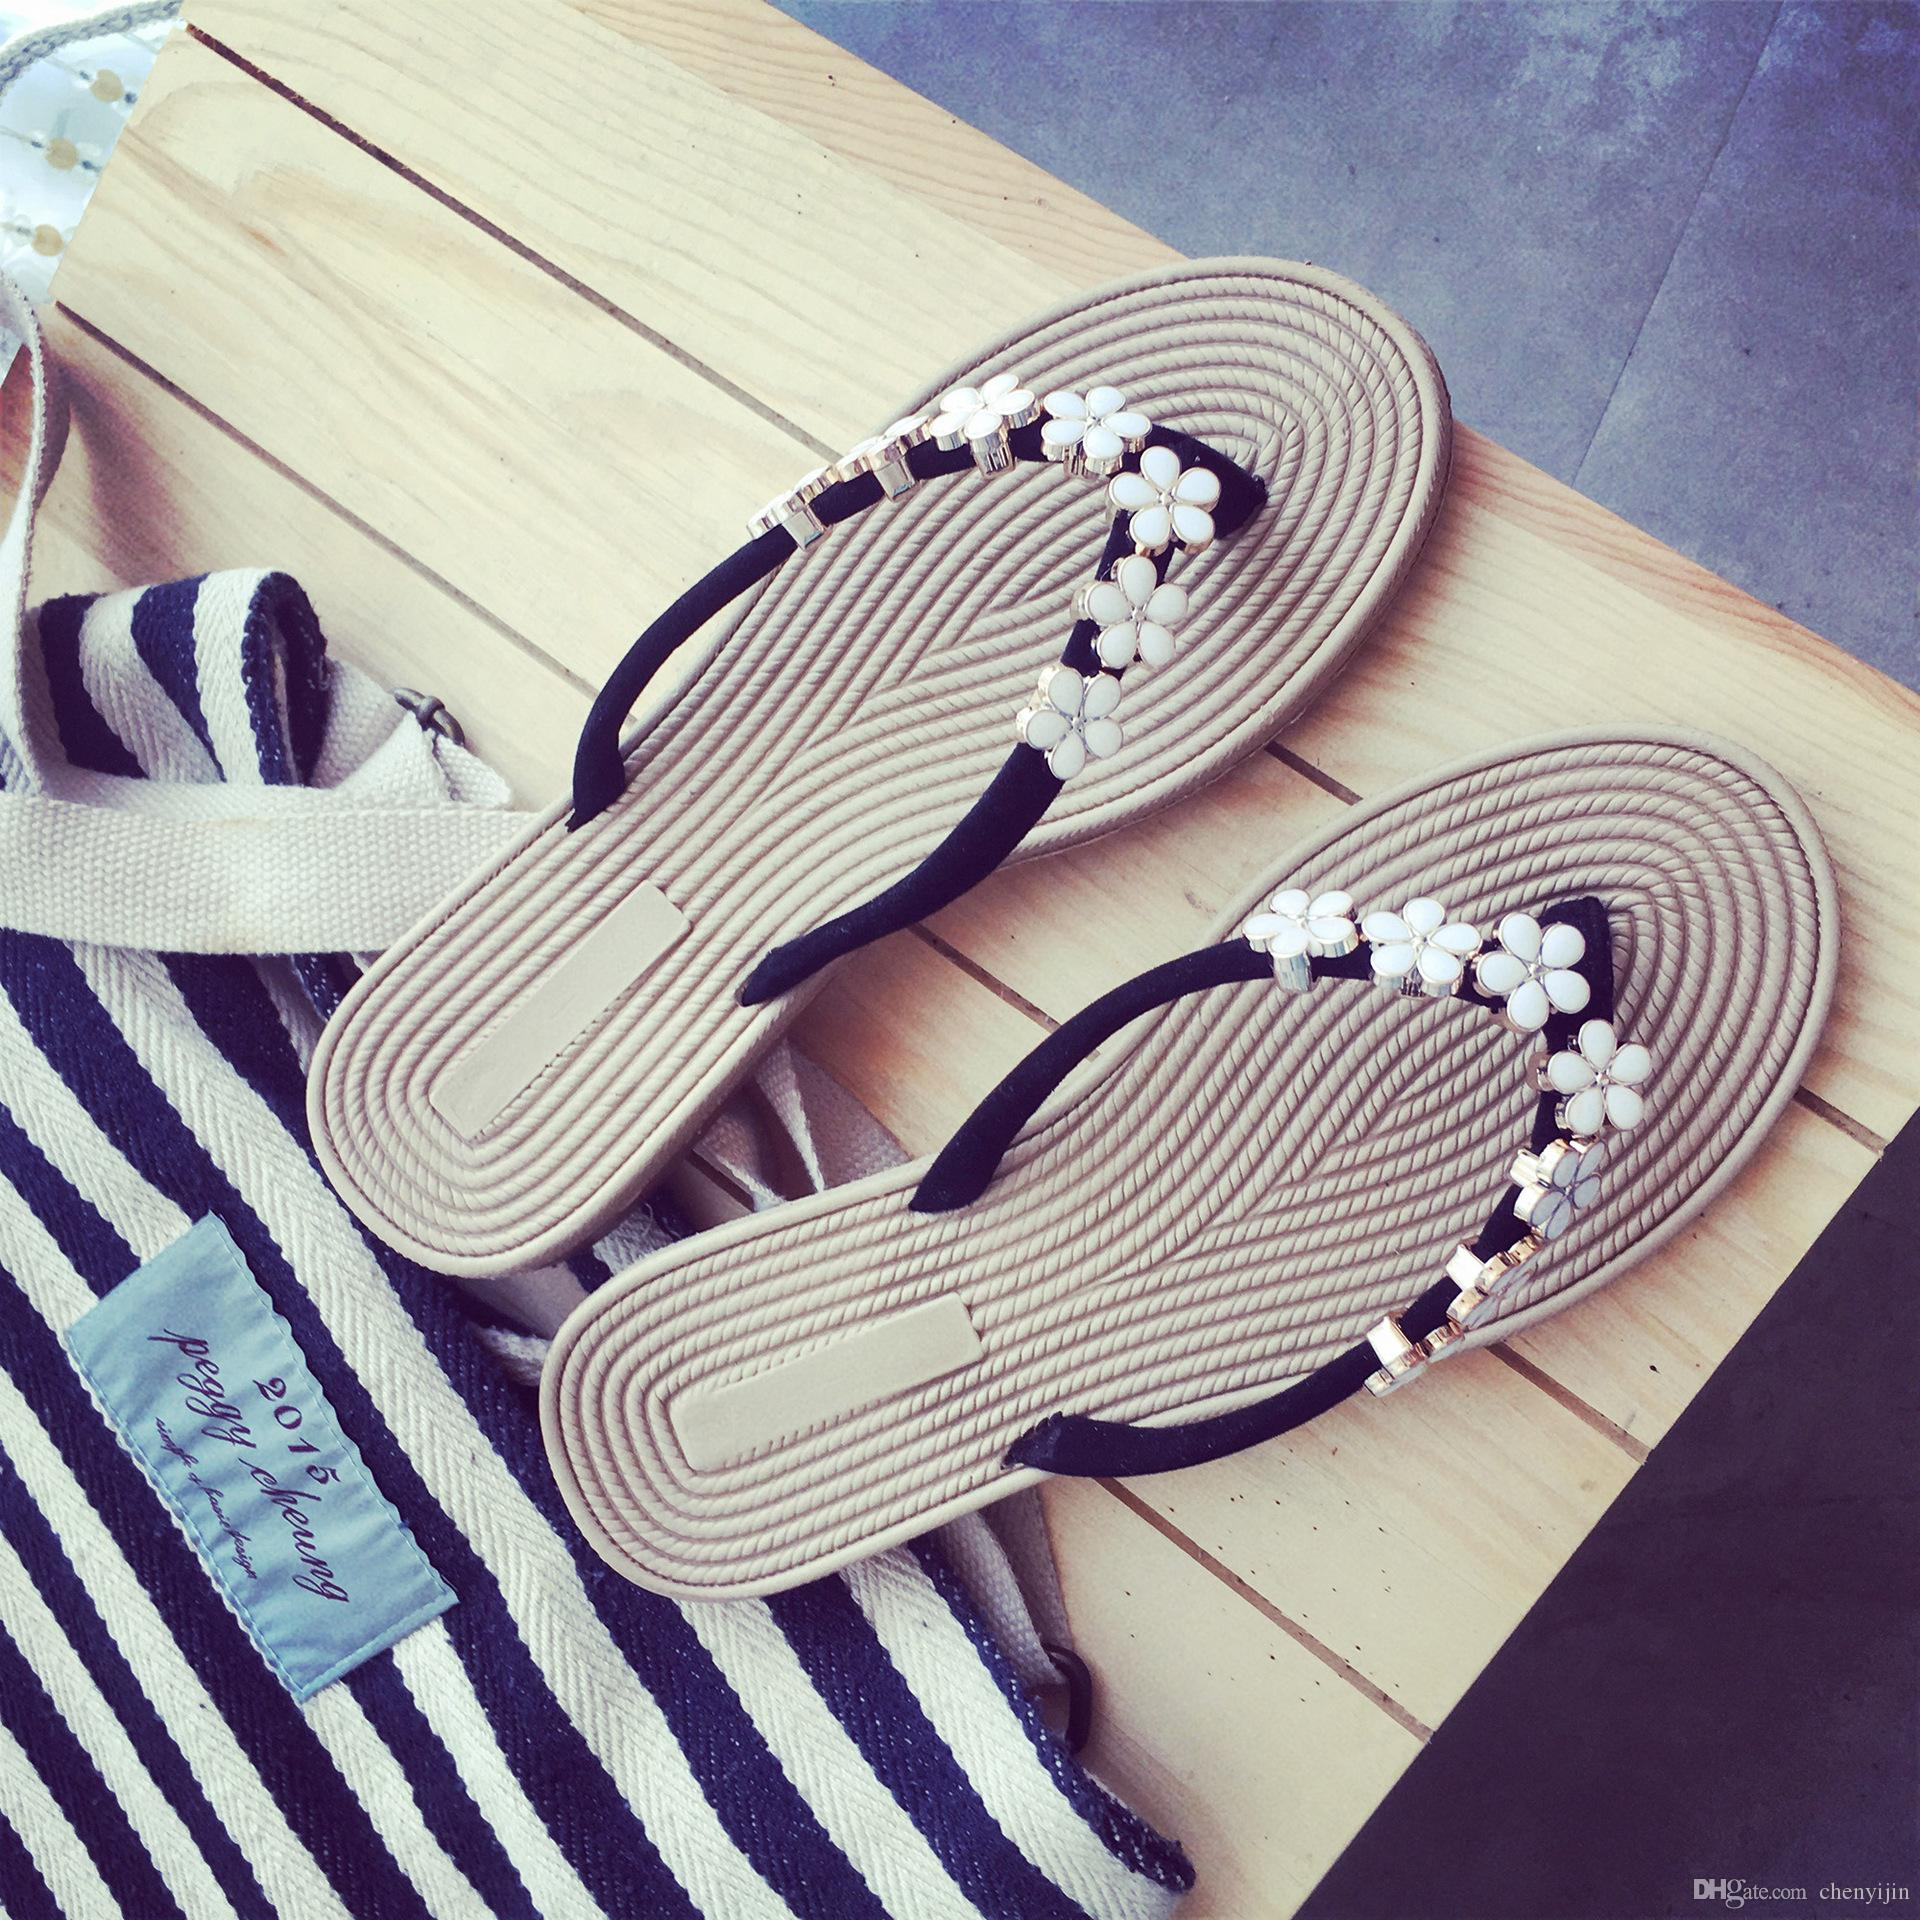 fe40dd93dd46d1 New Fashion Flower Beach Shoes Flat Bottom Leisure Sandals Female Shoes  Slippers Flip Flops Summer Cork Slipper Antiskid Slippers Wholesale Online  with ...